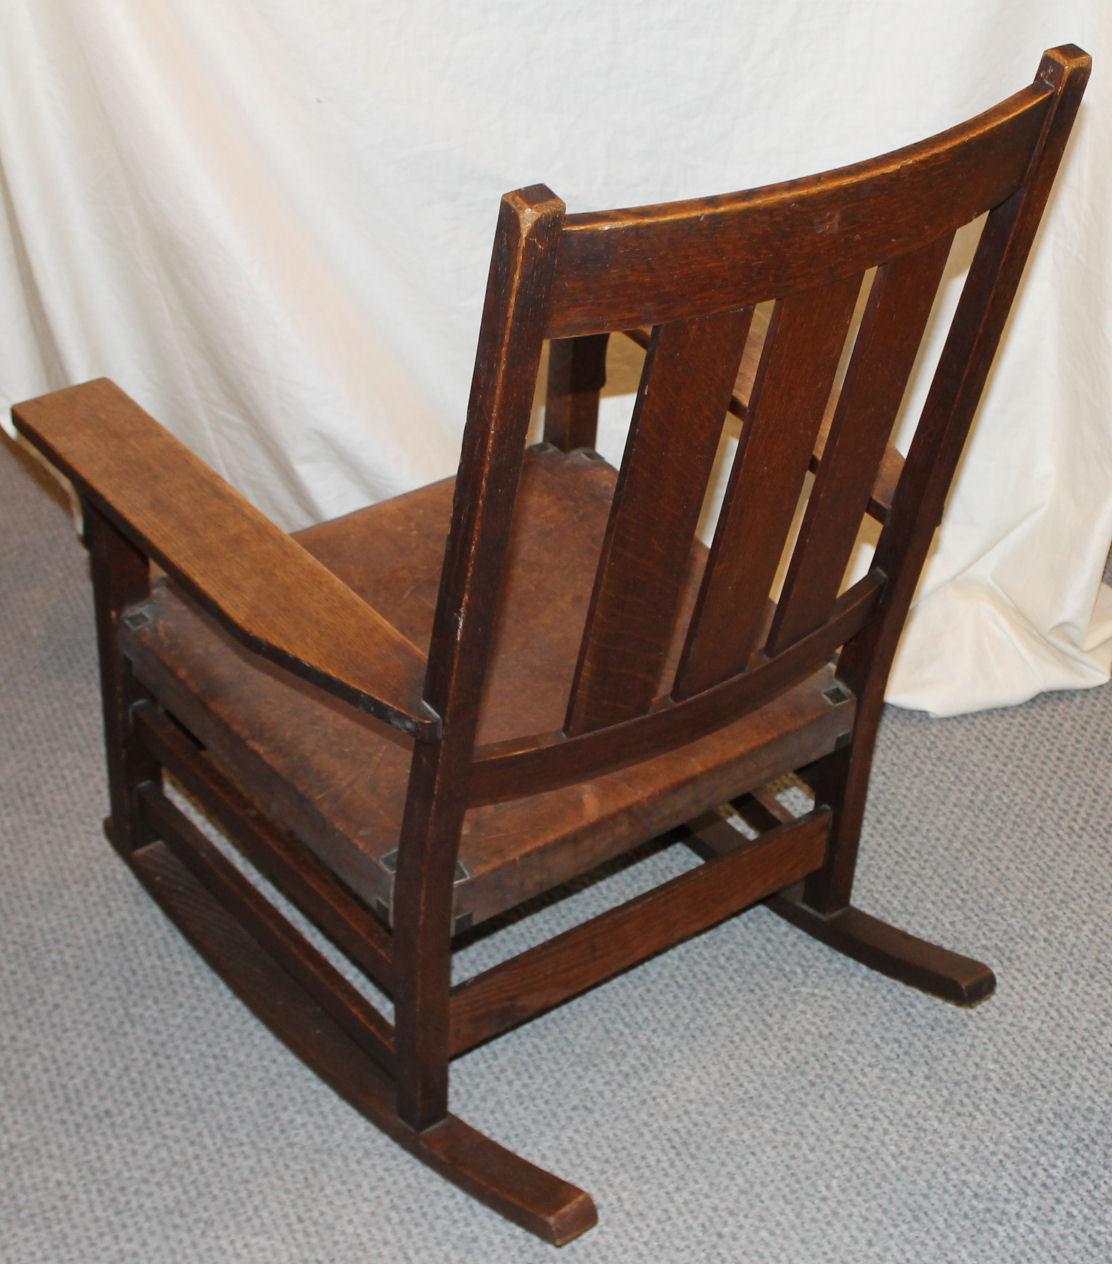 oak rocking chair plans foldable patio chairs bargain john s antiques gustav stickley 365 sold